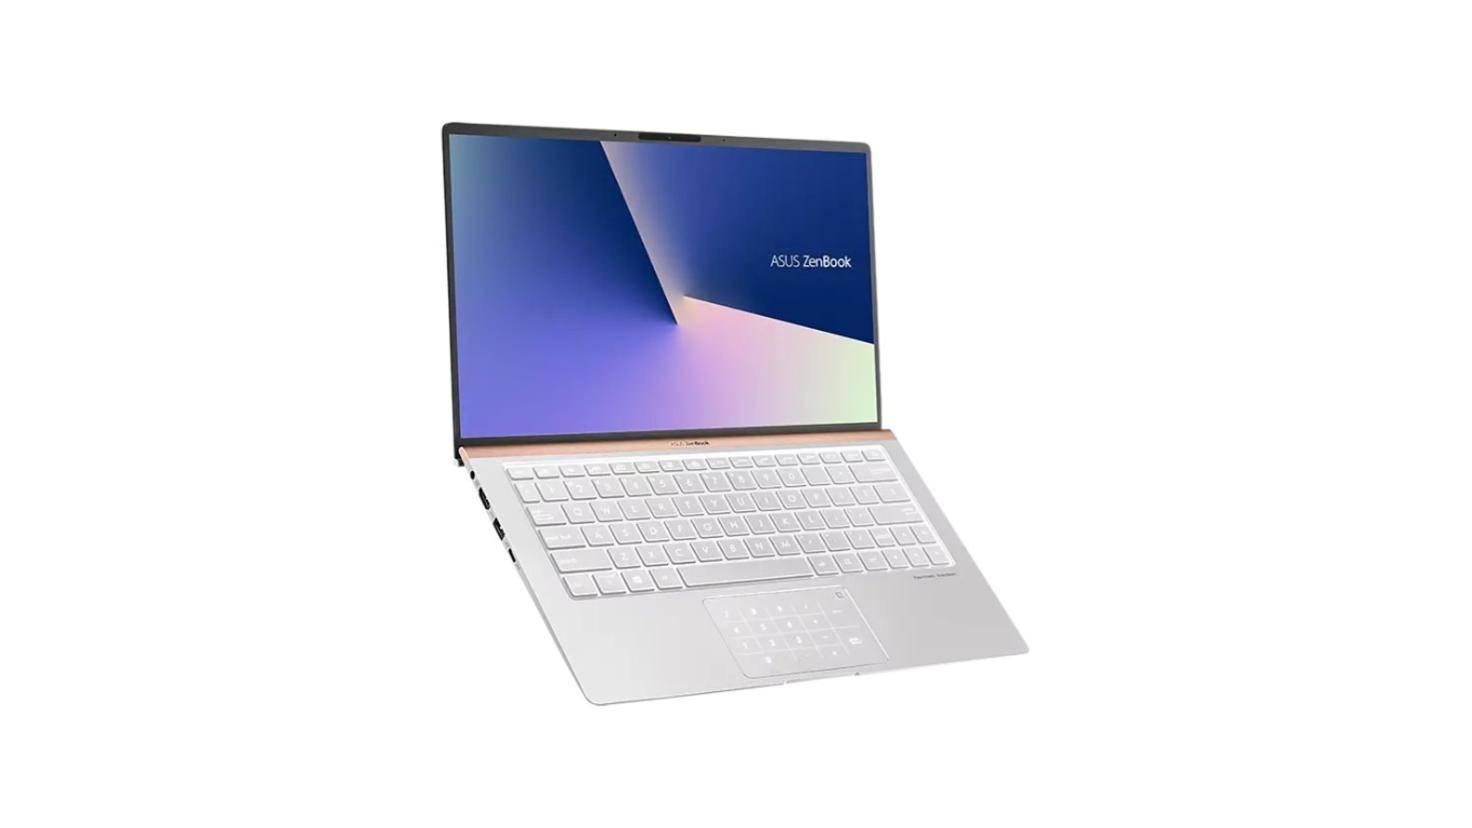 asus-zenbook-13-laptop